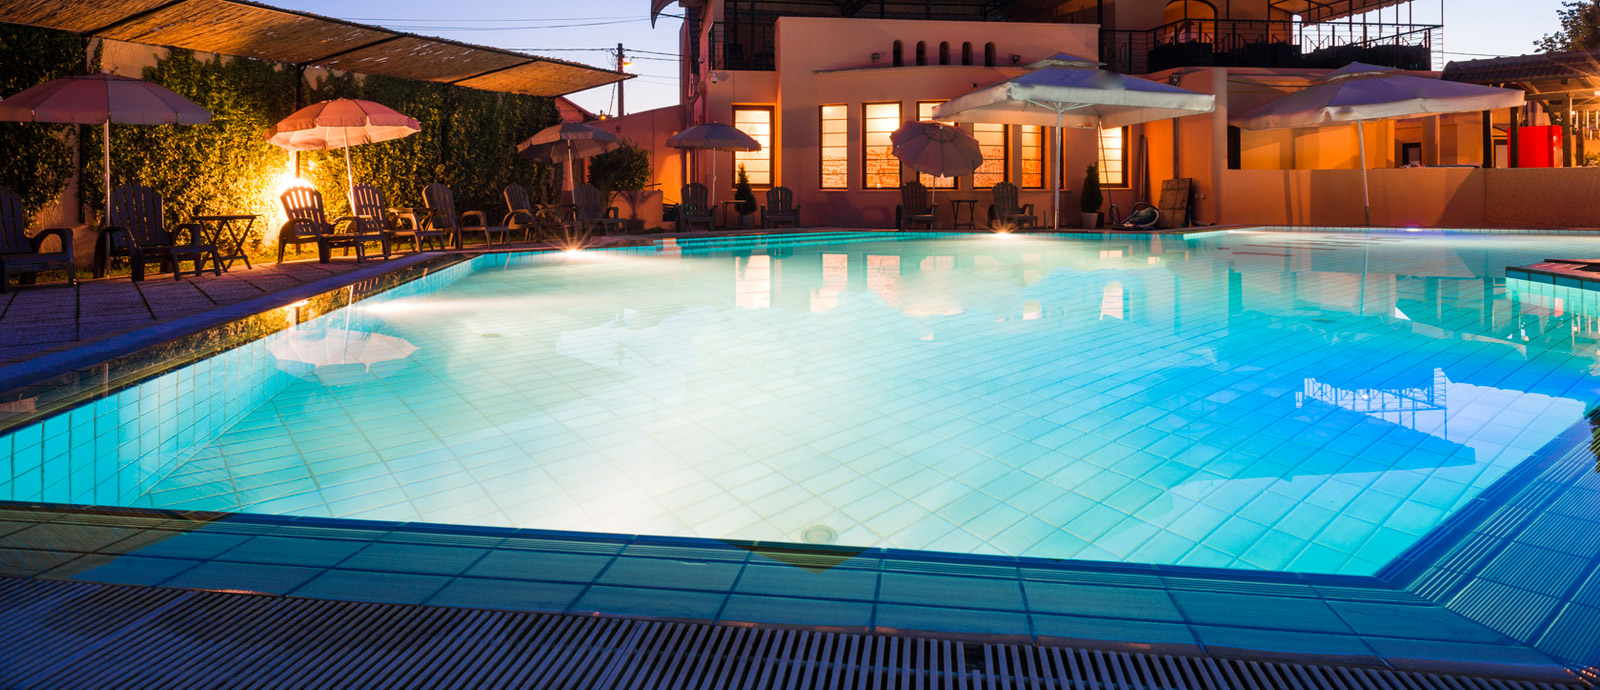 Piscine a sfioro global piscine - Piscine usate subito it ...